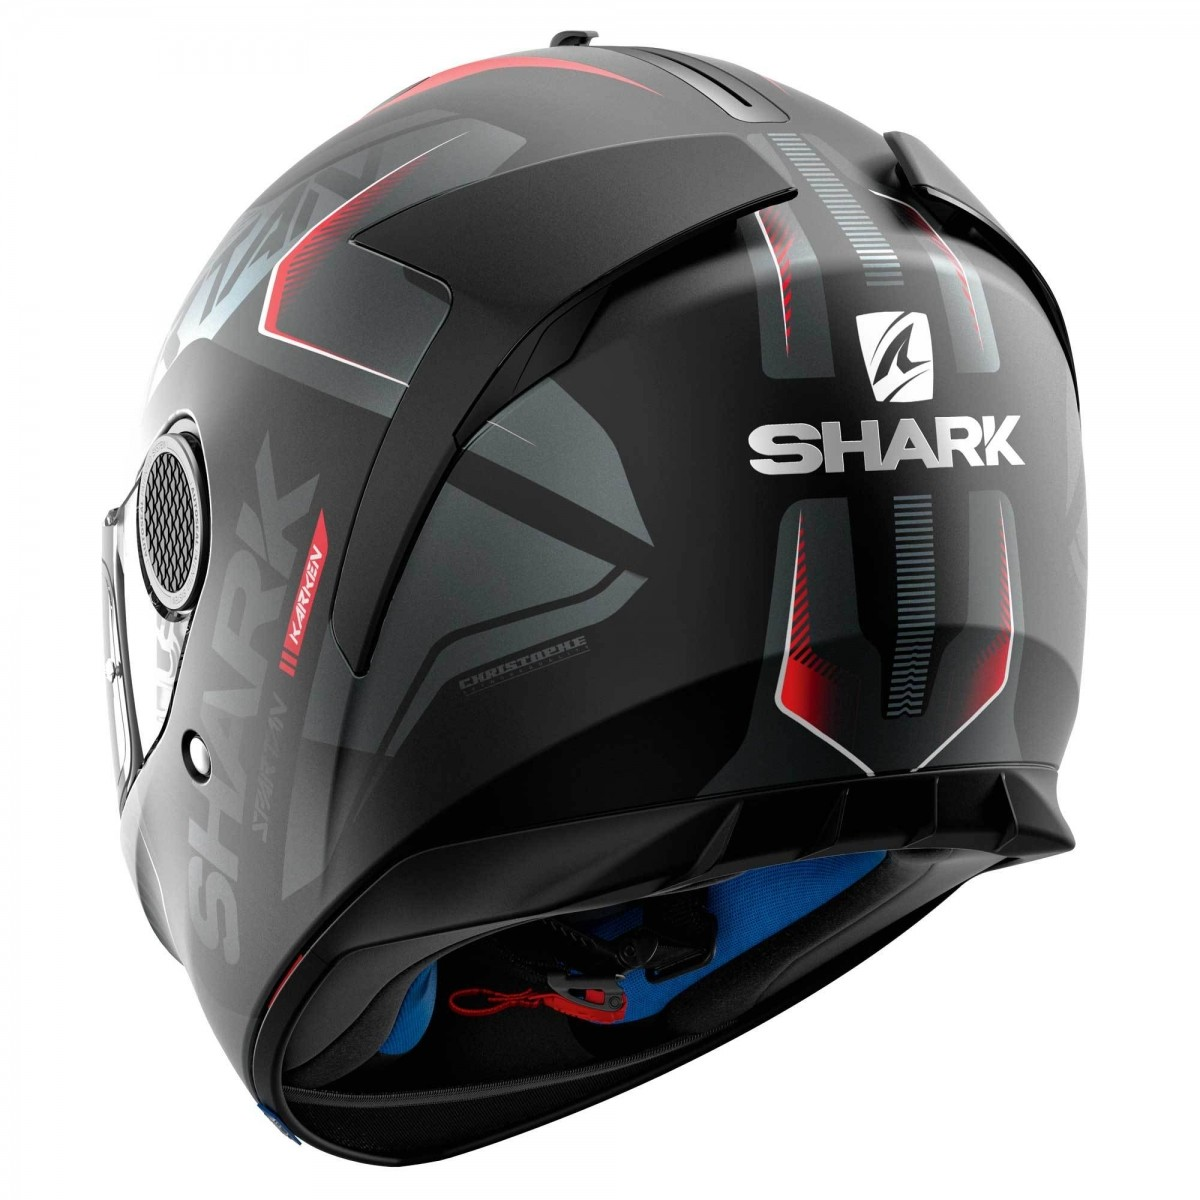 Capacete Shark Spartan Karken Matt Kra  - Nova Suzuki Motos e Acessórios